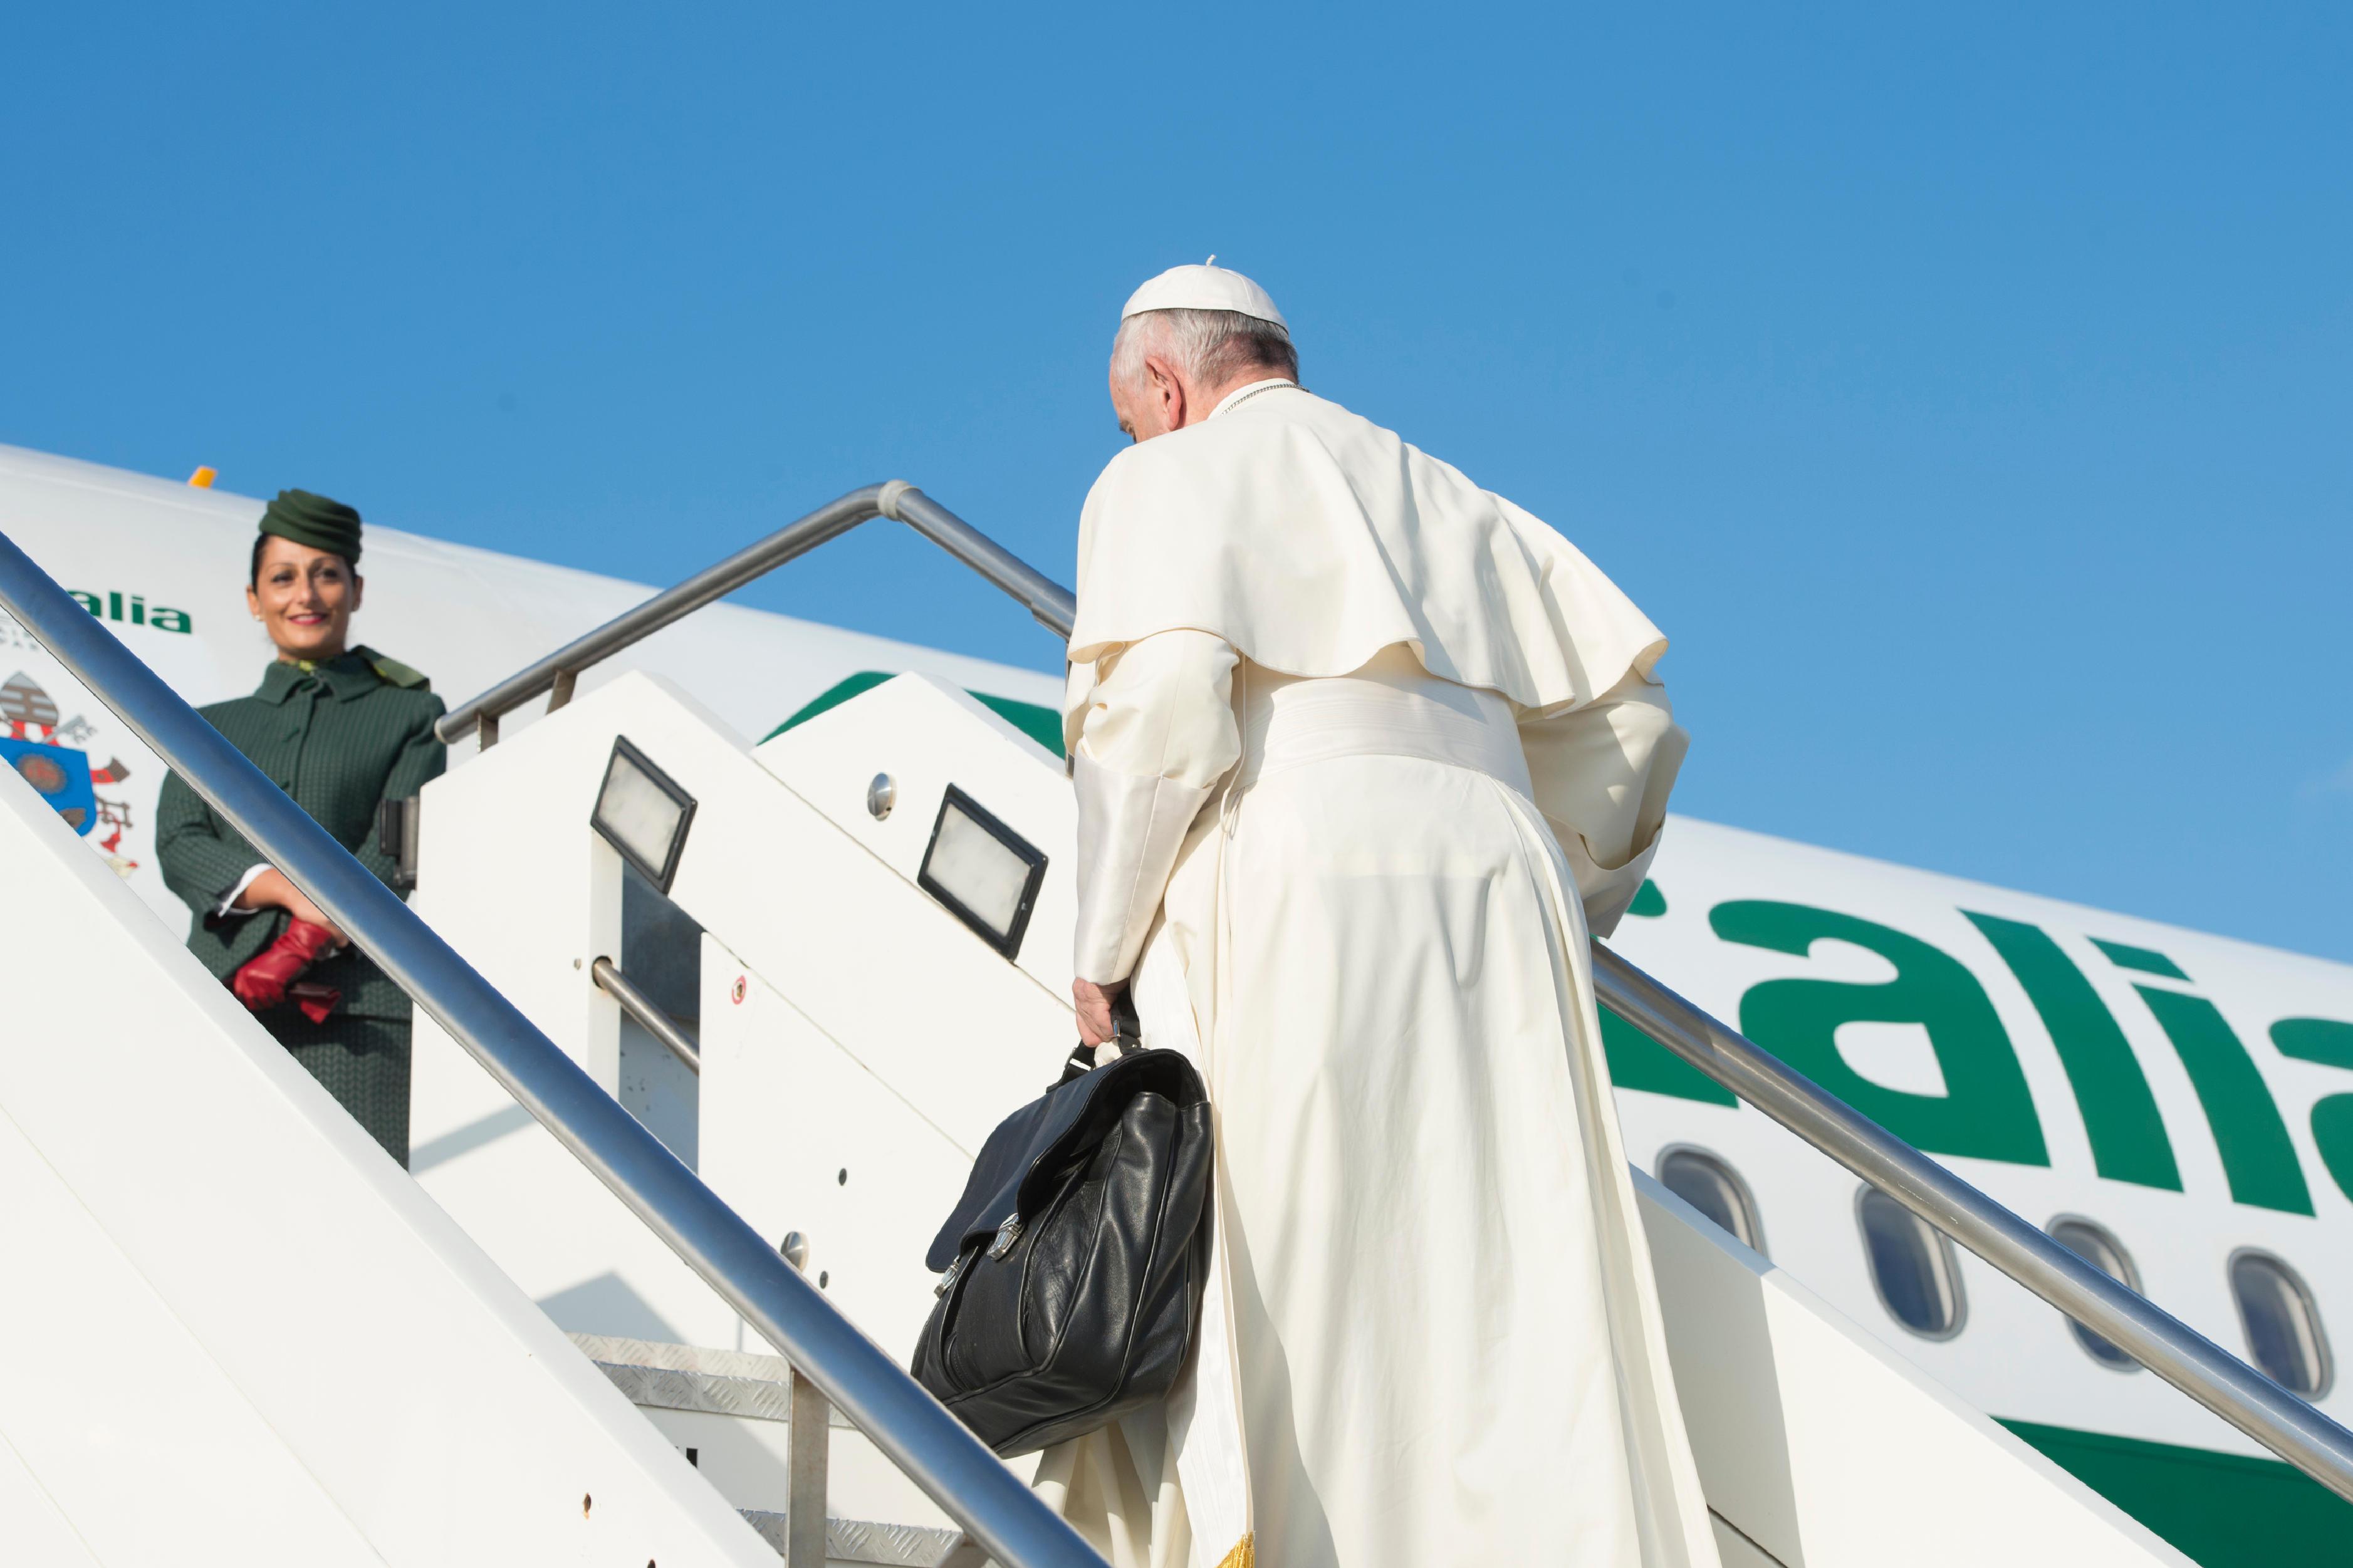 Le pape embarque à bord d'un avion d'Alitalia © L'Osservatore Romano